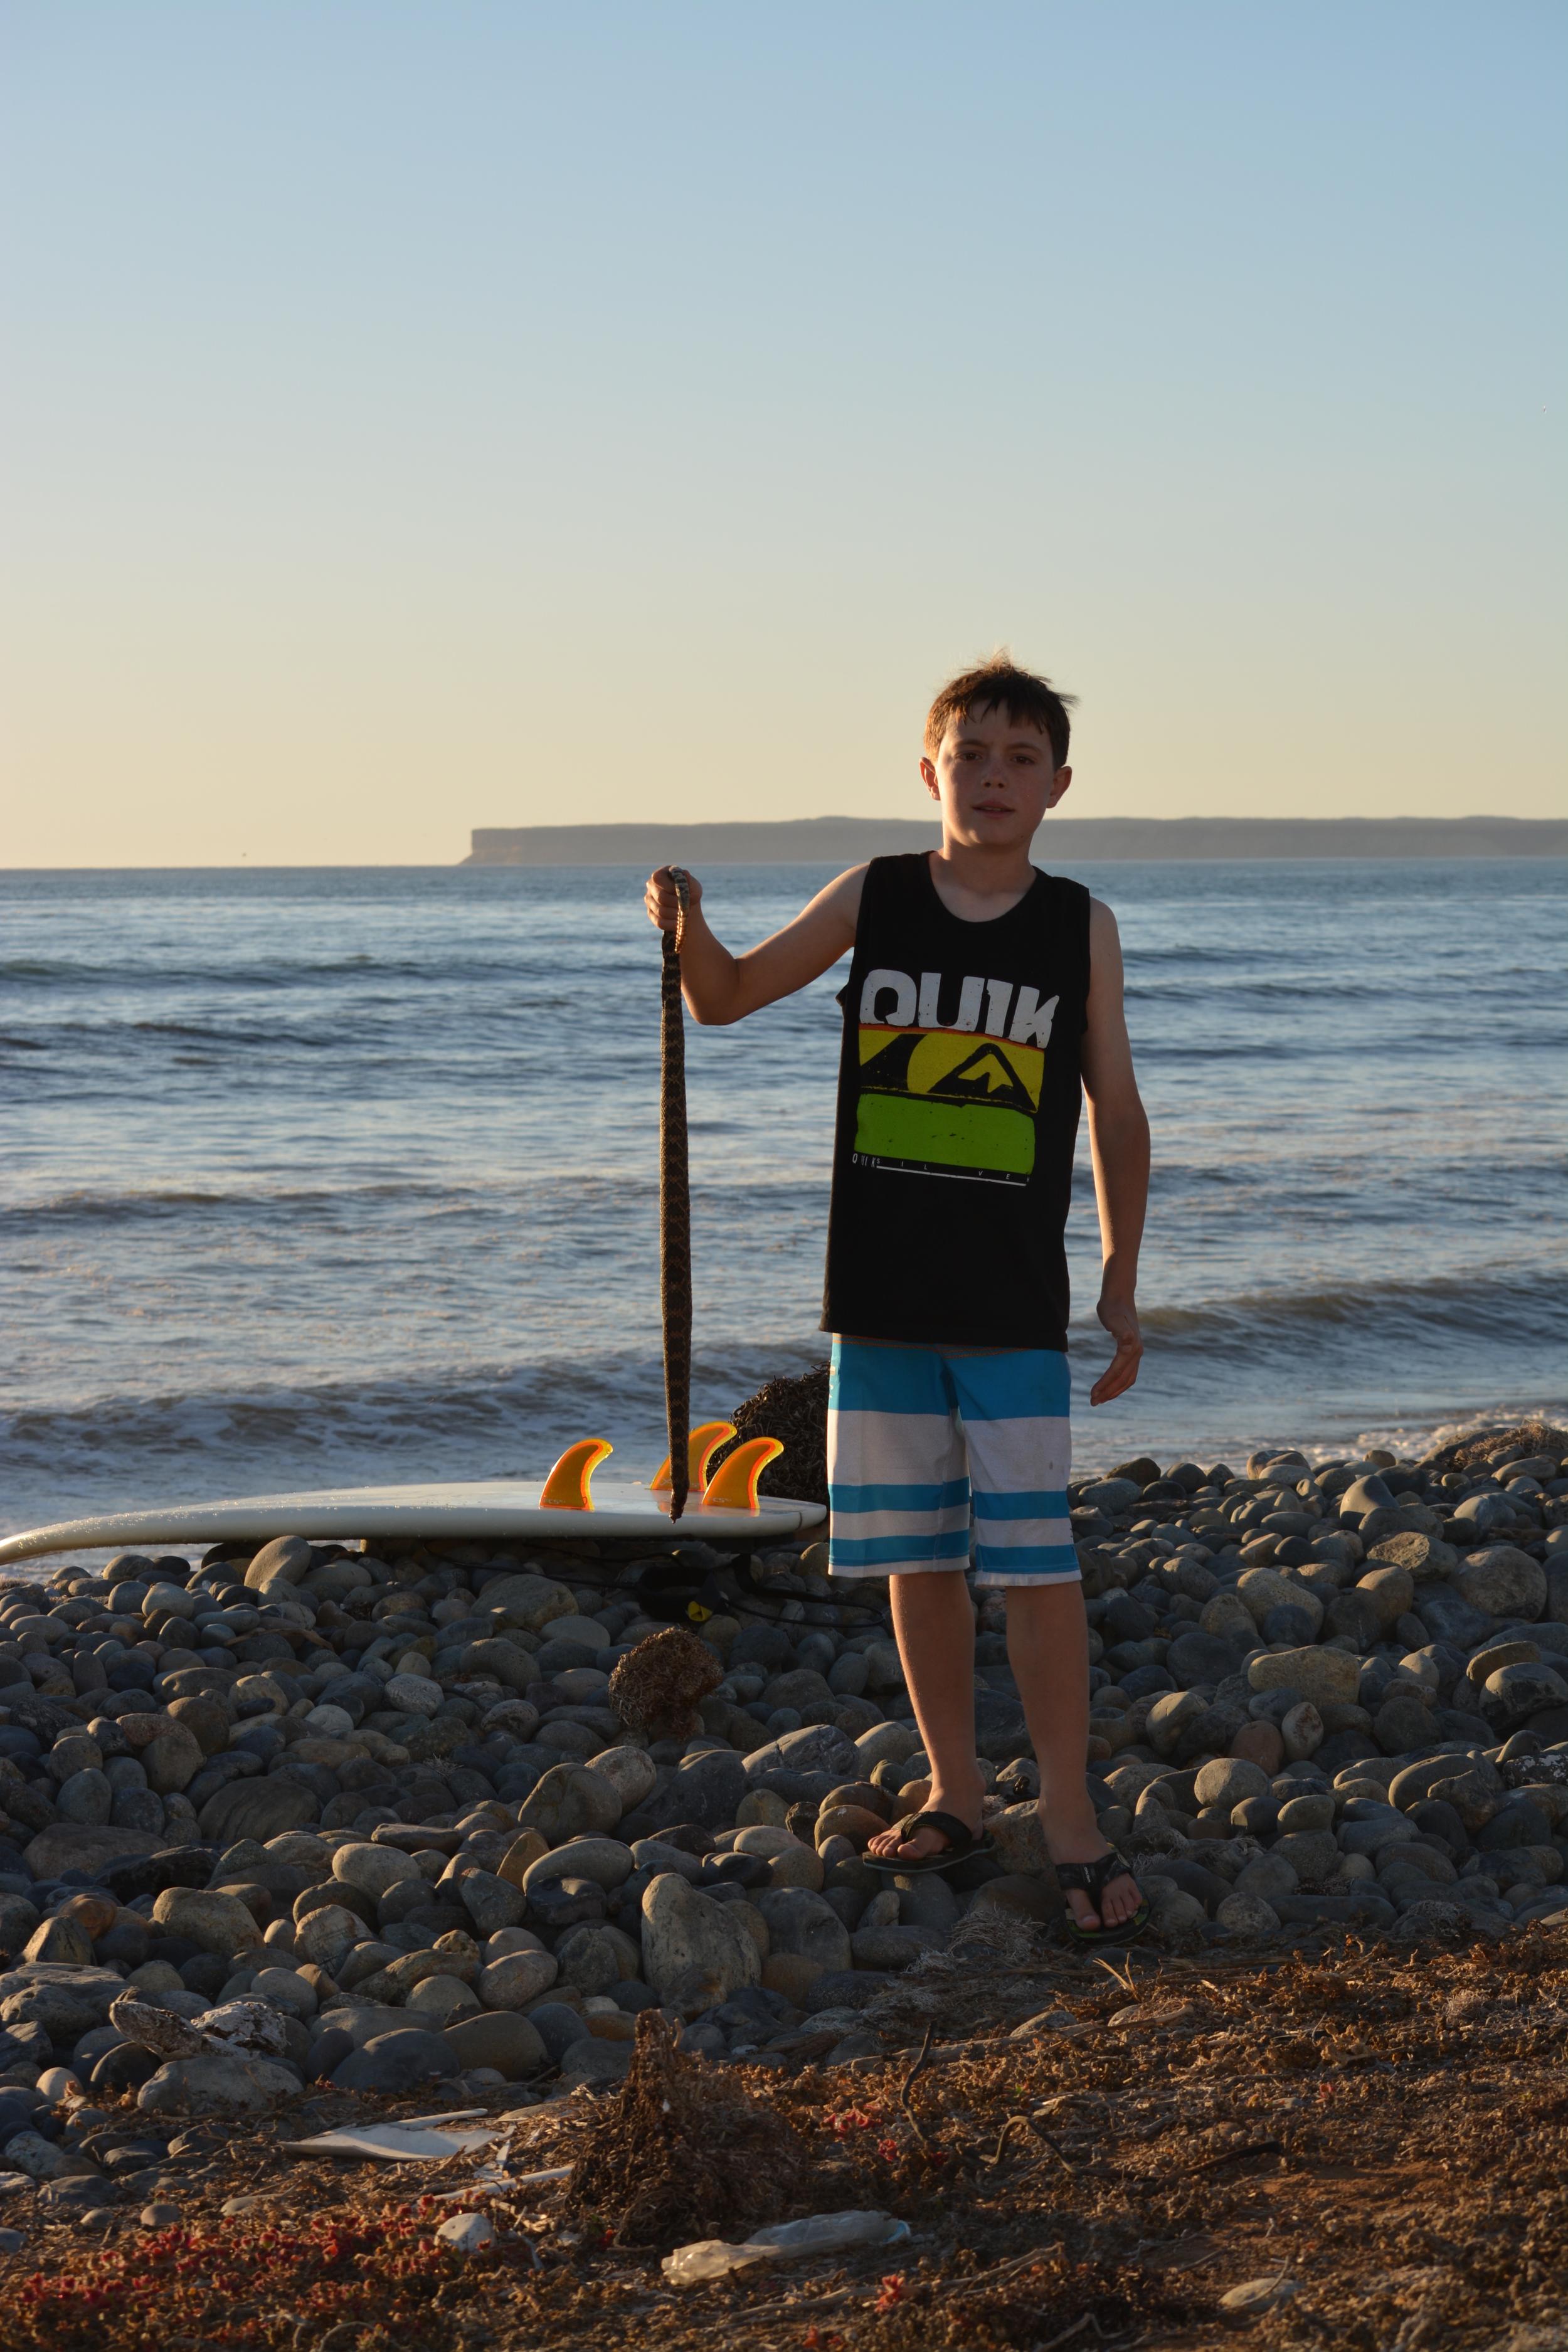 Baja California 10-5-13 Shipwrecks Surfing Adventure Ocean Experience Surf School San Diego (110).JPG